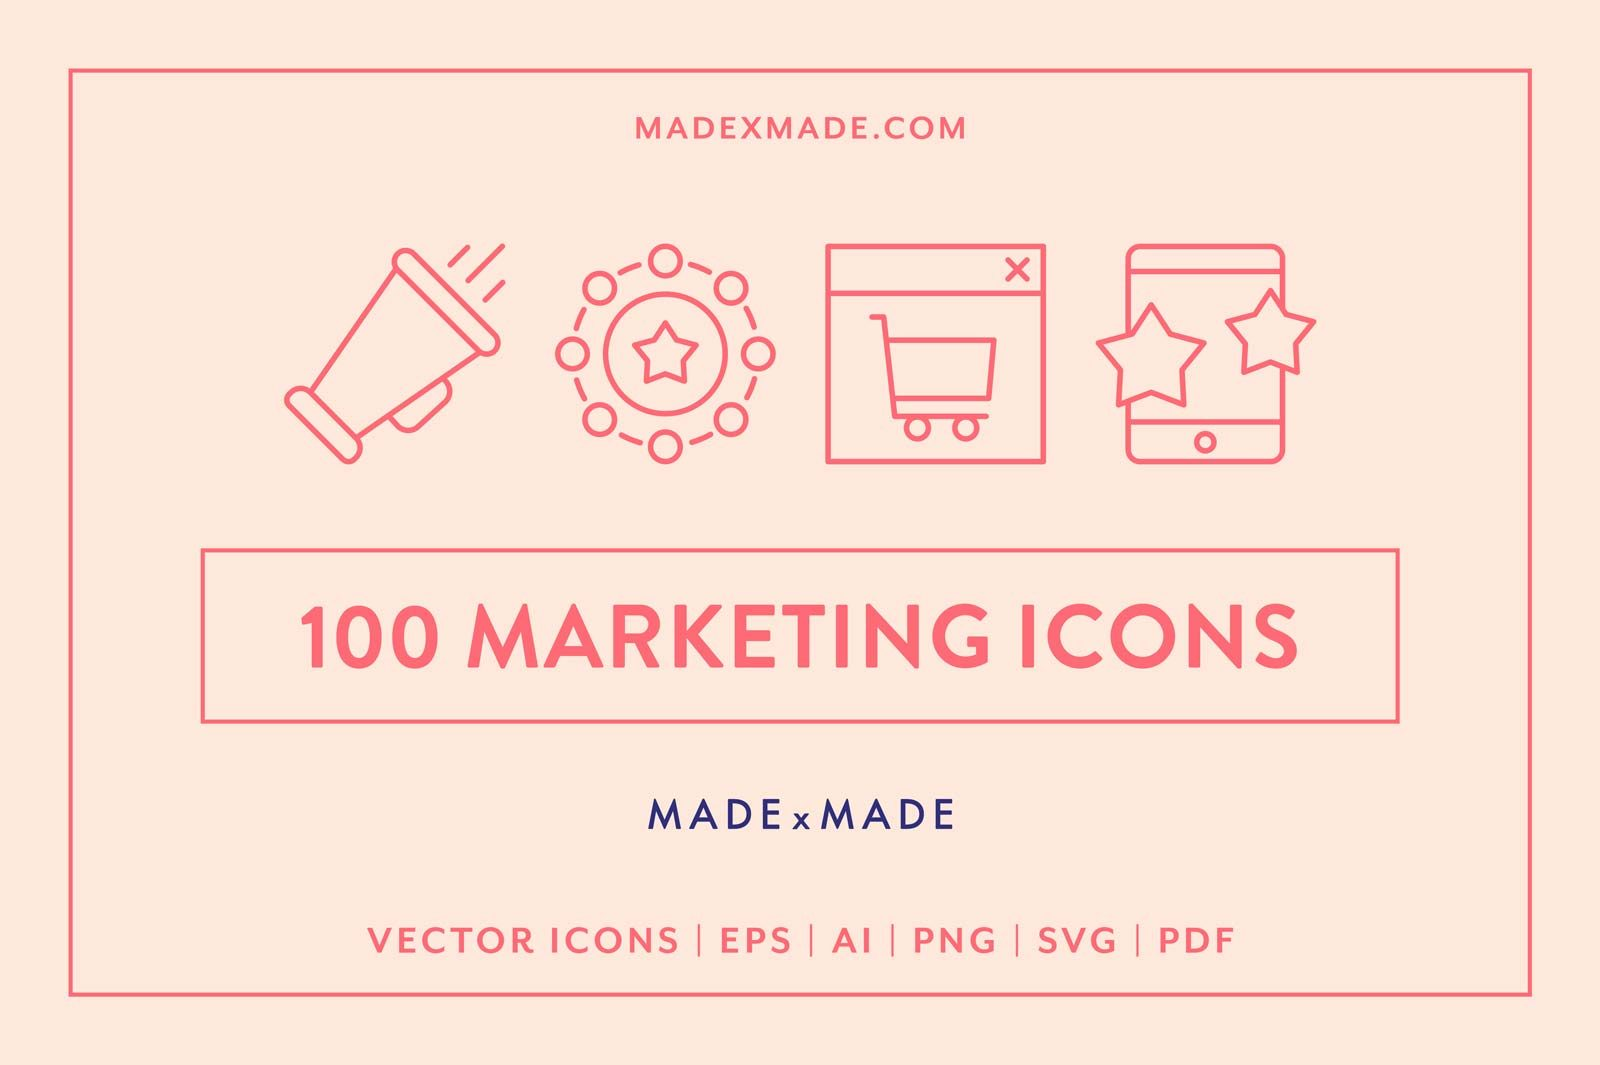 made x made icons marketing